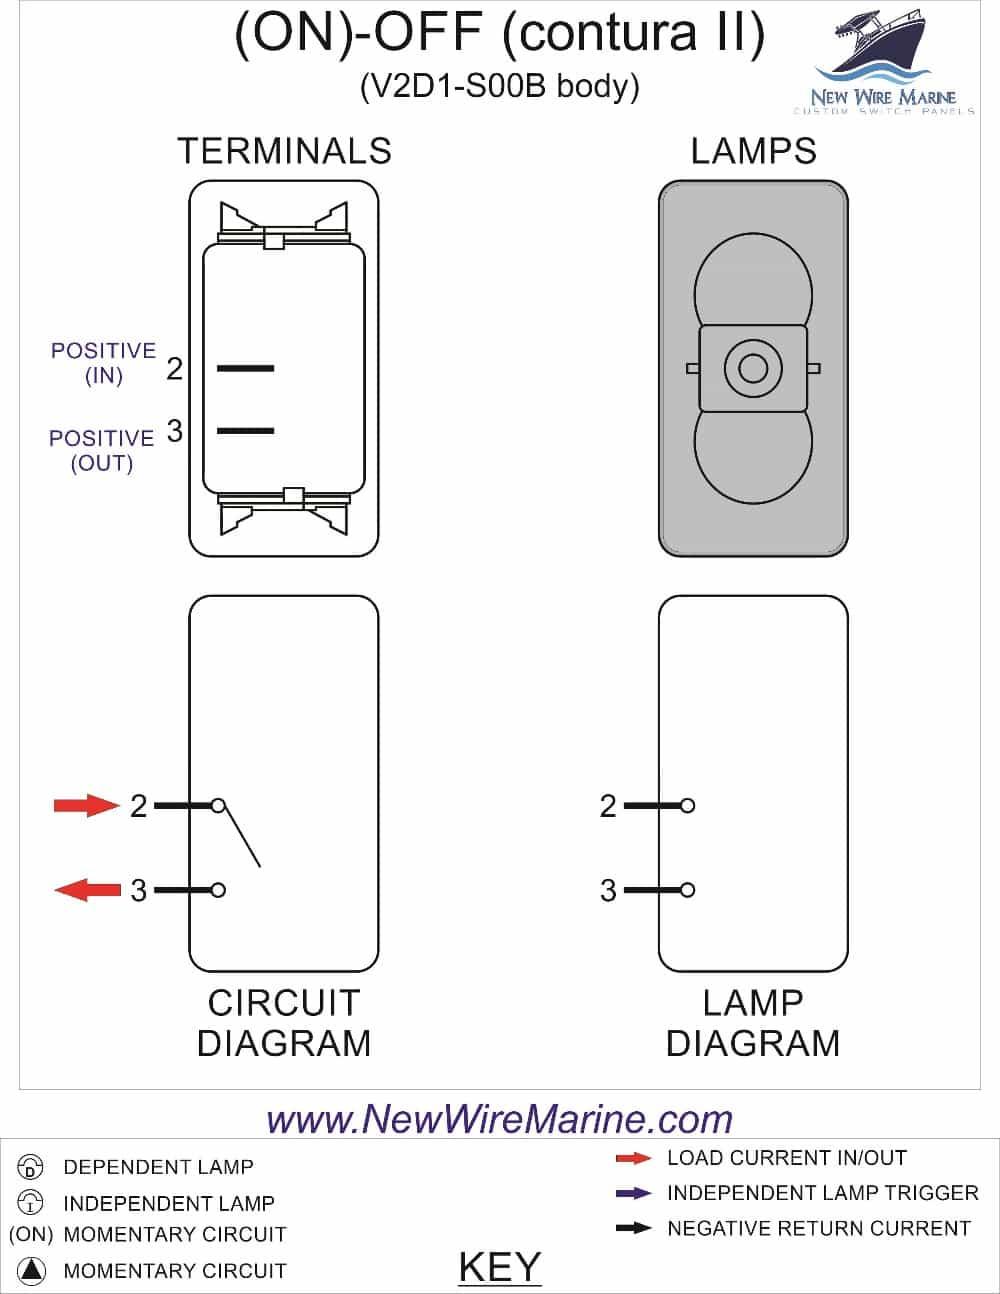 Red Horn Rocker Switch | Carling Contura Ii | Illuminated | Accessory - Switch Wiring Diagram